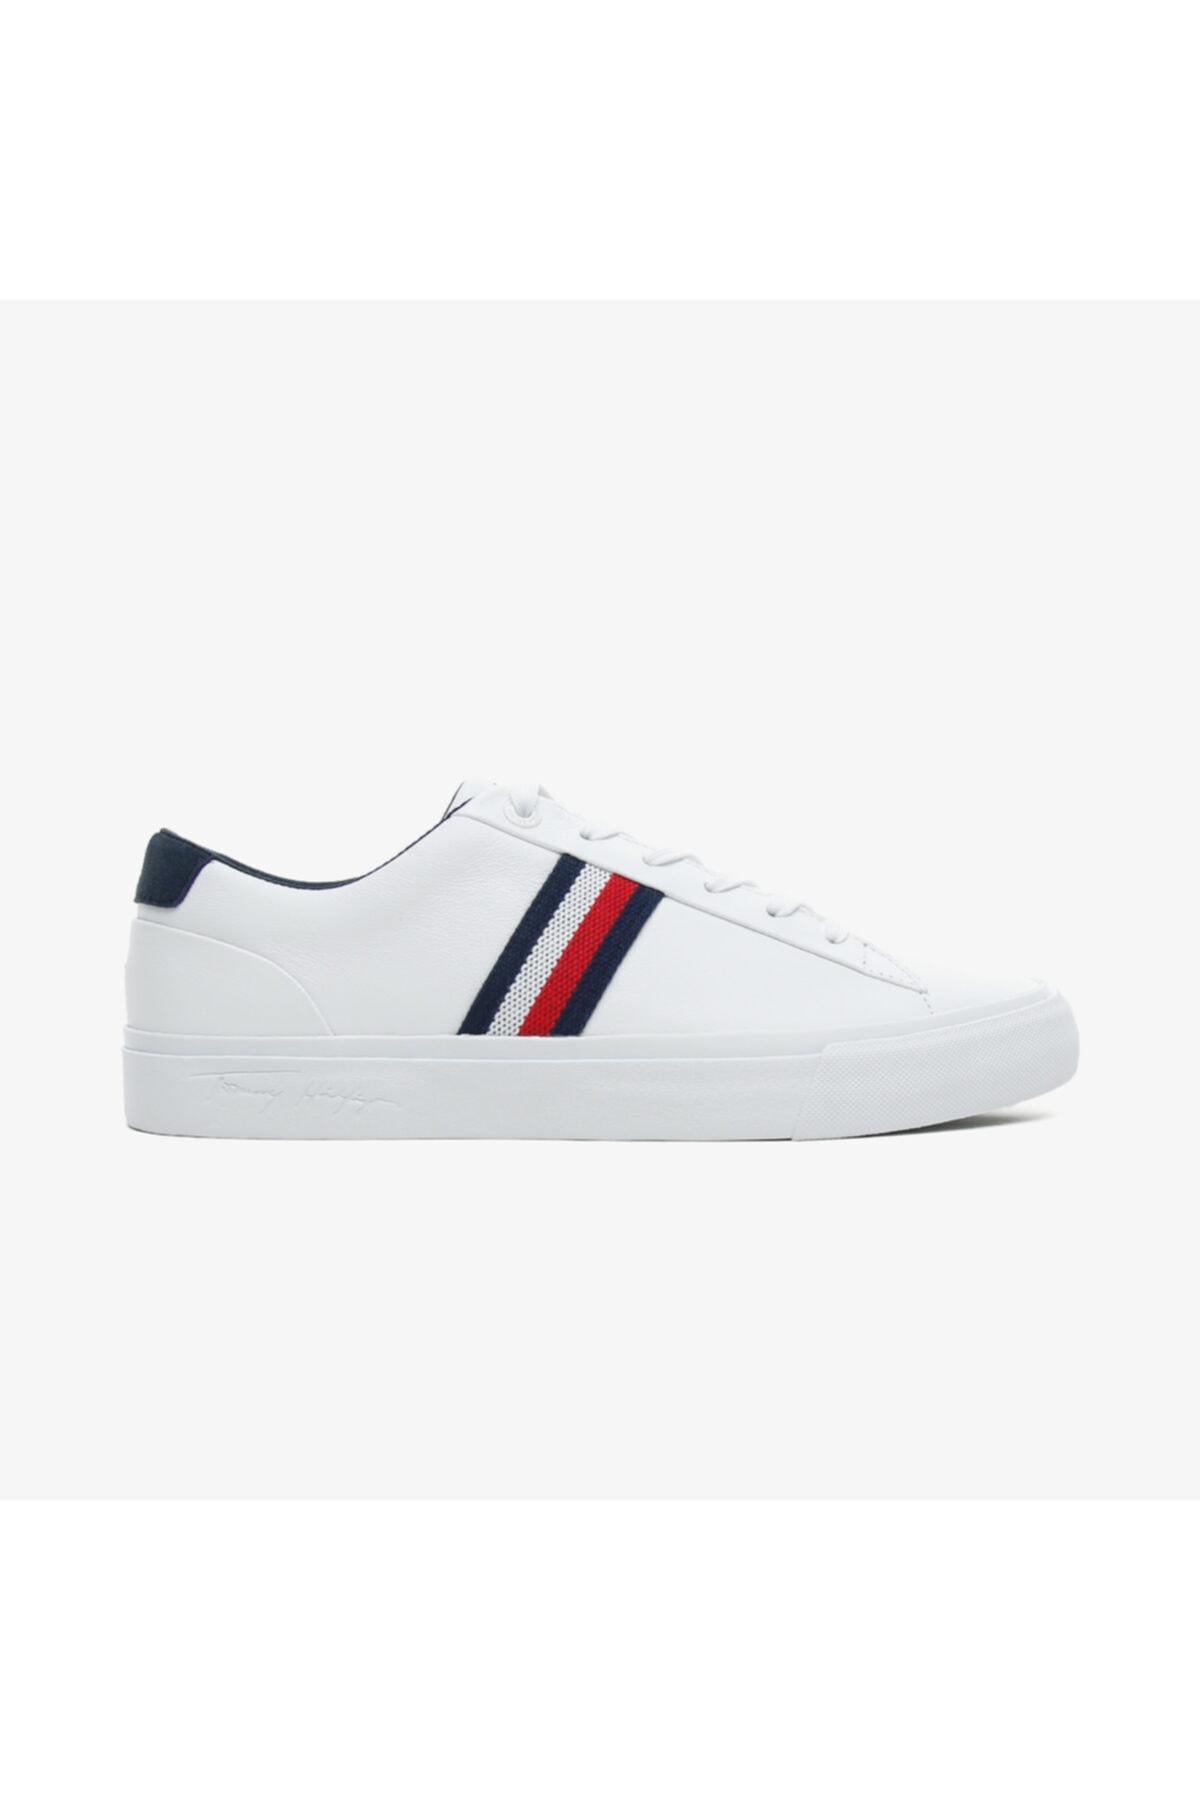 Tommy Hilfiger Erkek Beyaz Bağcıklı Sneaker 1